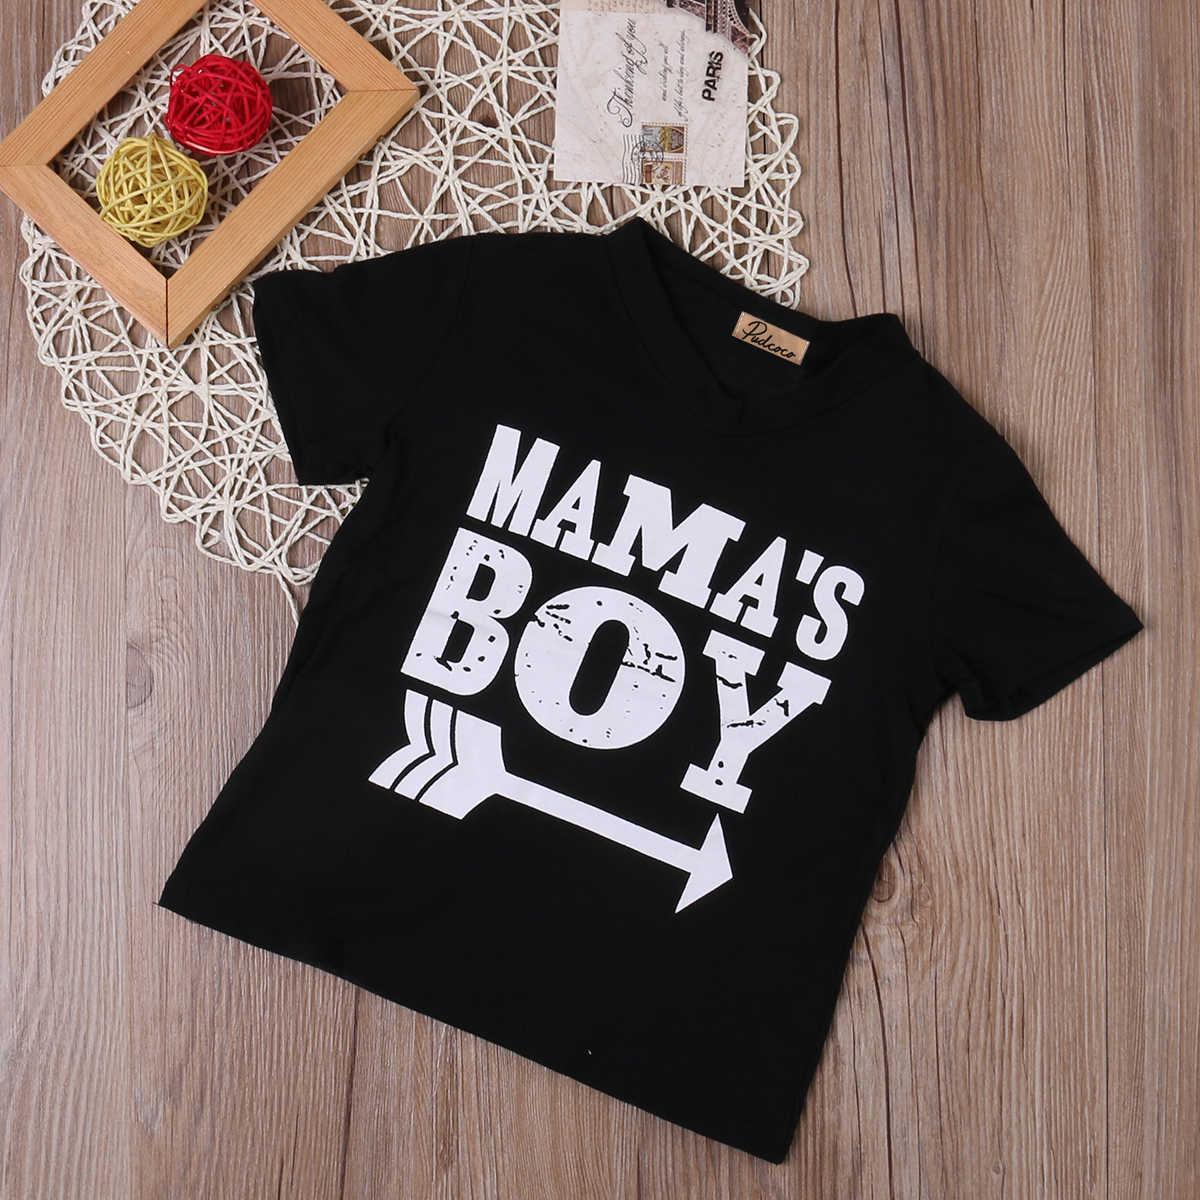 4c0ac6ab ... 2018 Kids Mama Boy Printed Tops Mama Baby Boys Short Sleeve Arrow Black  Cotton T Shirt ...